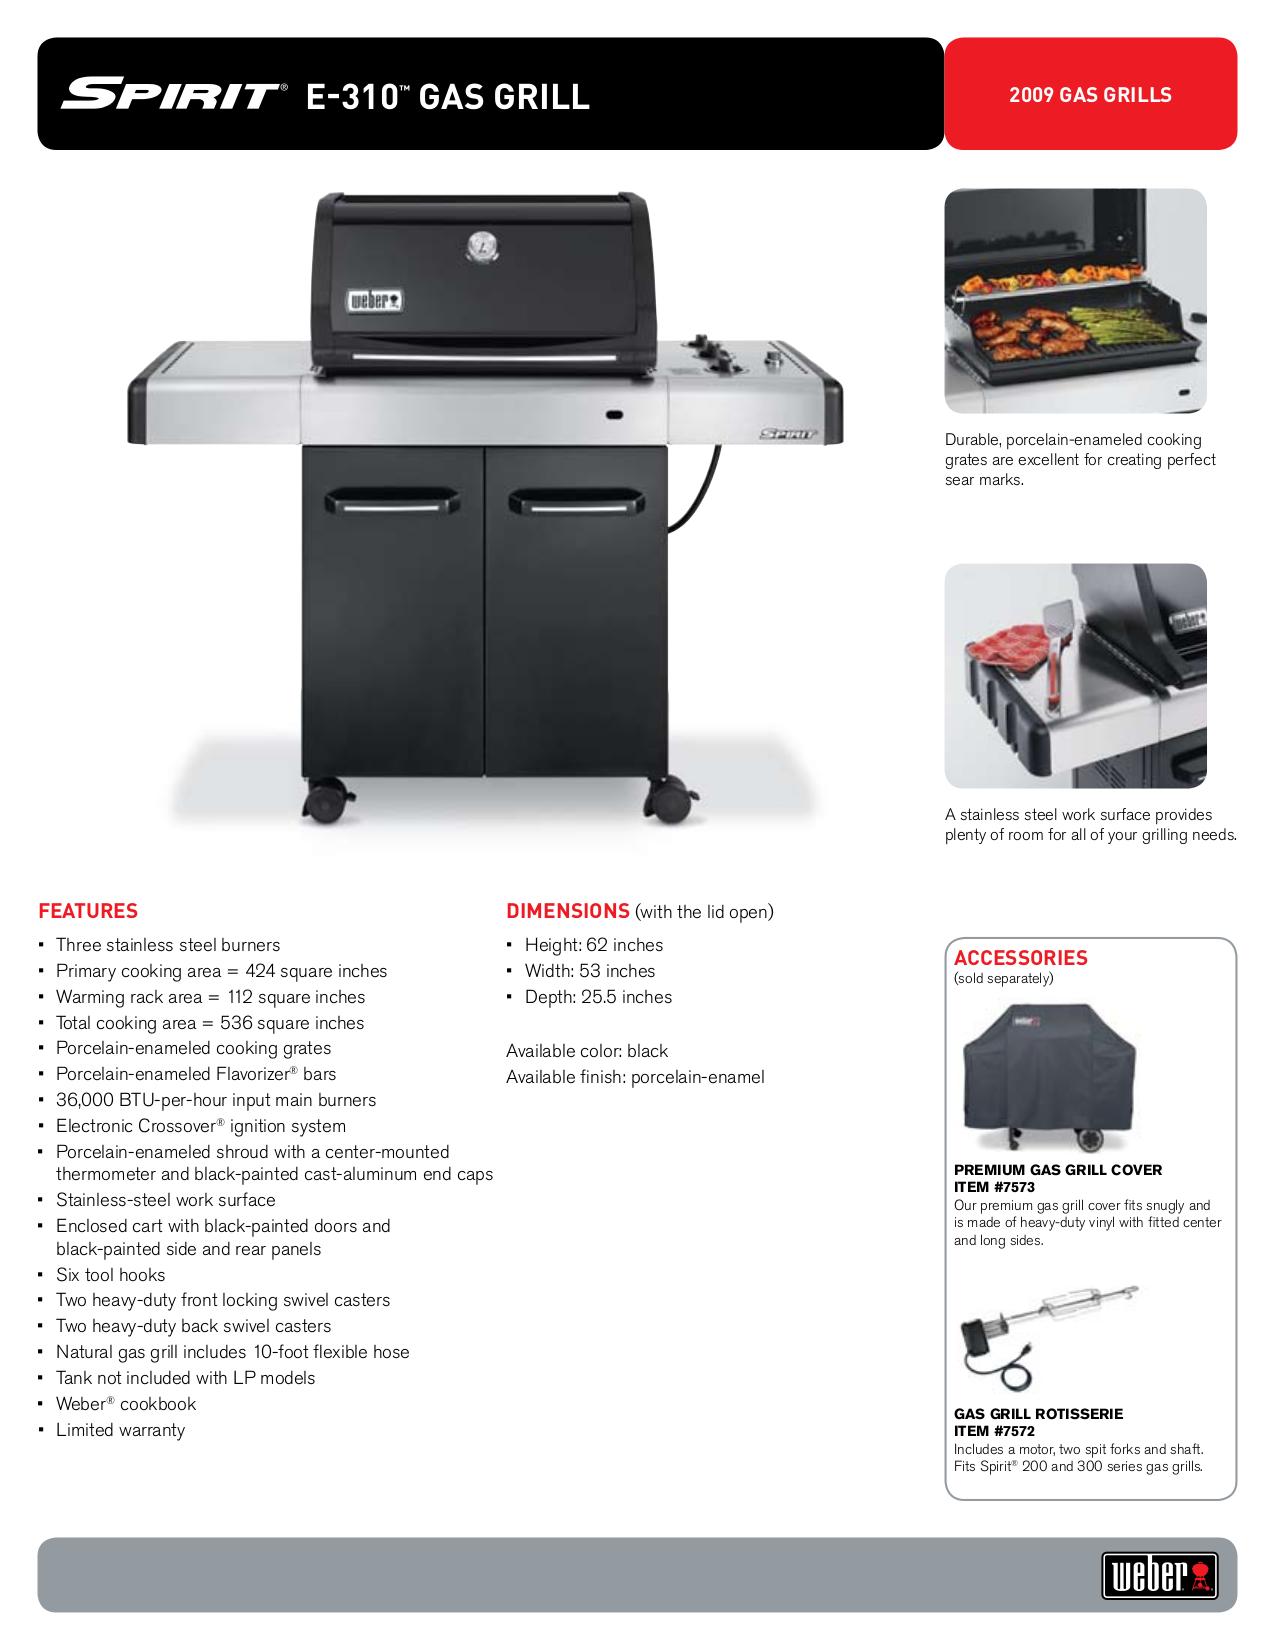 pdf for Weber Grill E-310 manual